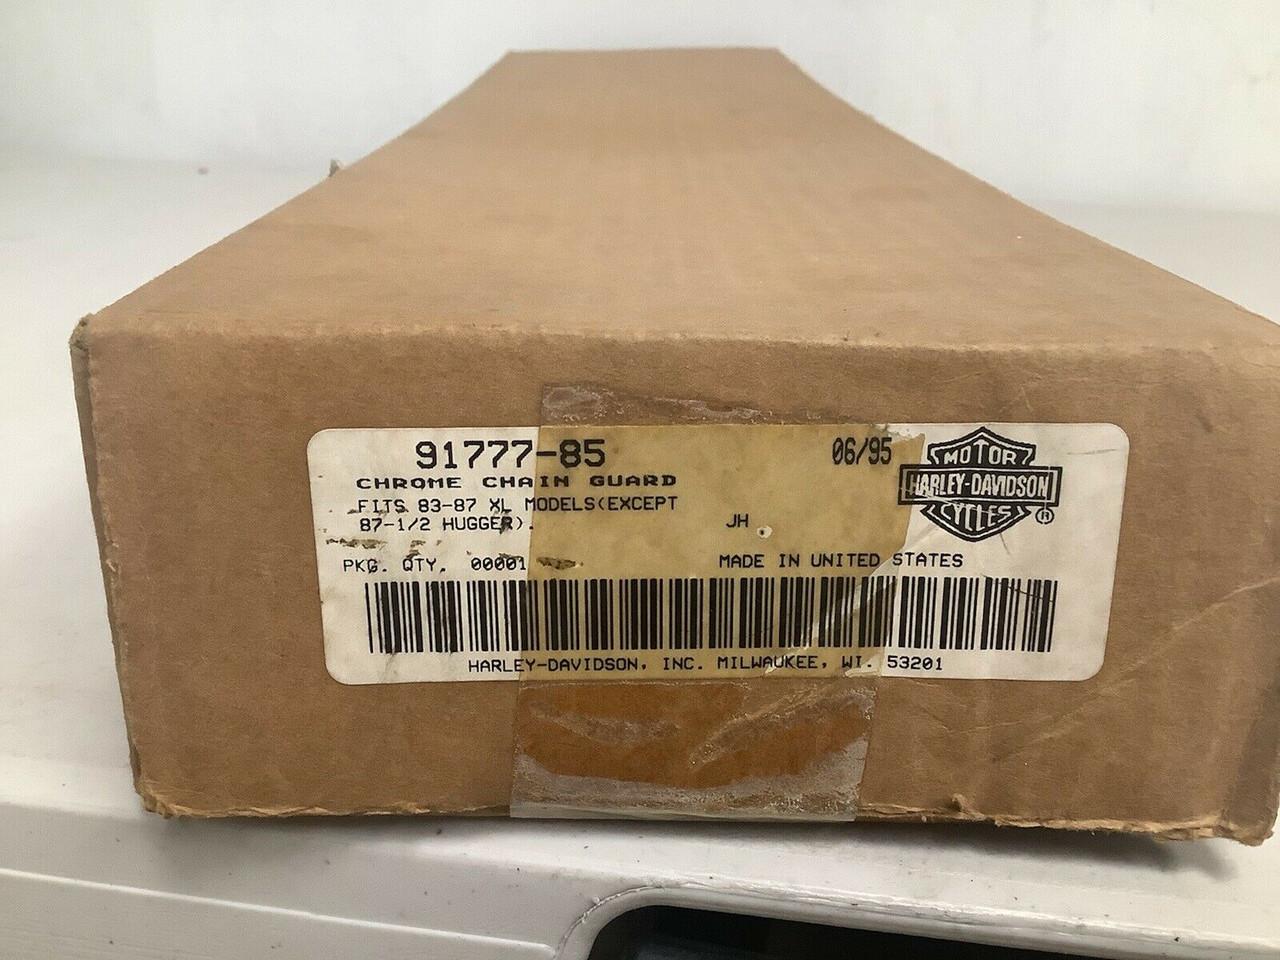 NOS HARLEY-DAVIDSON CHROME CHAIN GUARD 91777-85 SPORTSTER 83-'87 XL MODELS, shopthegarage.com, shop the garage, coolintocash.com, cool into cash, Bingo's Swap Meet Garage